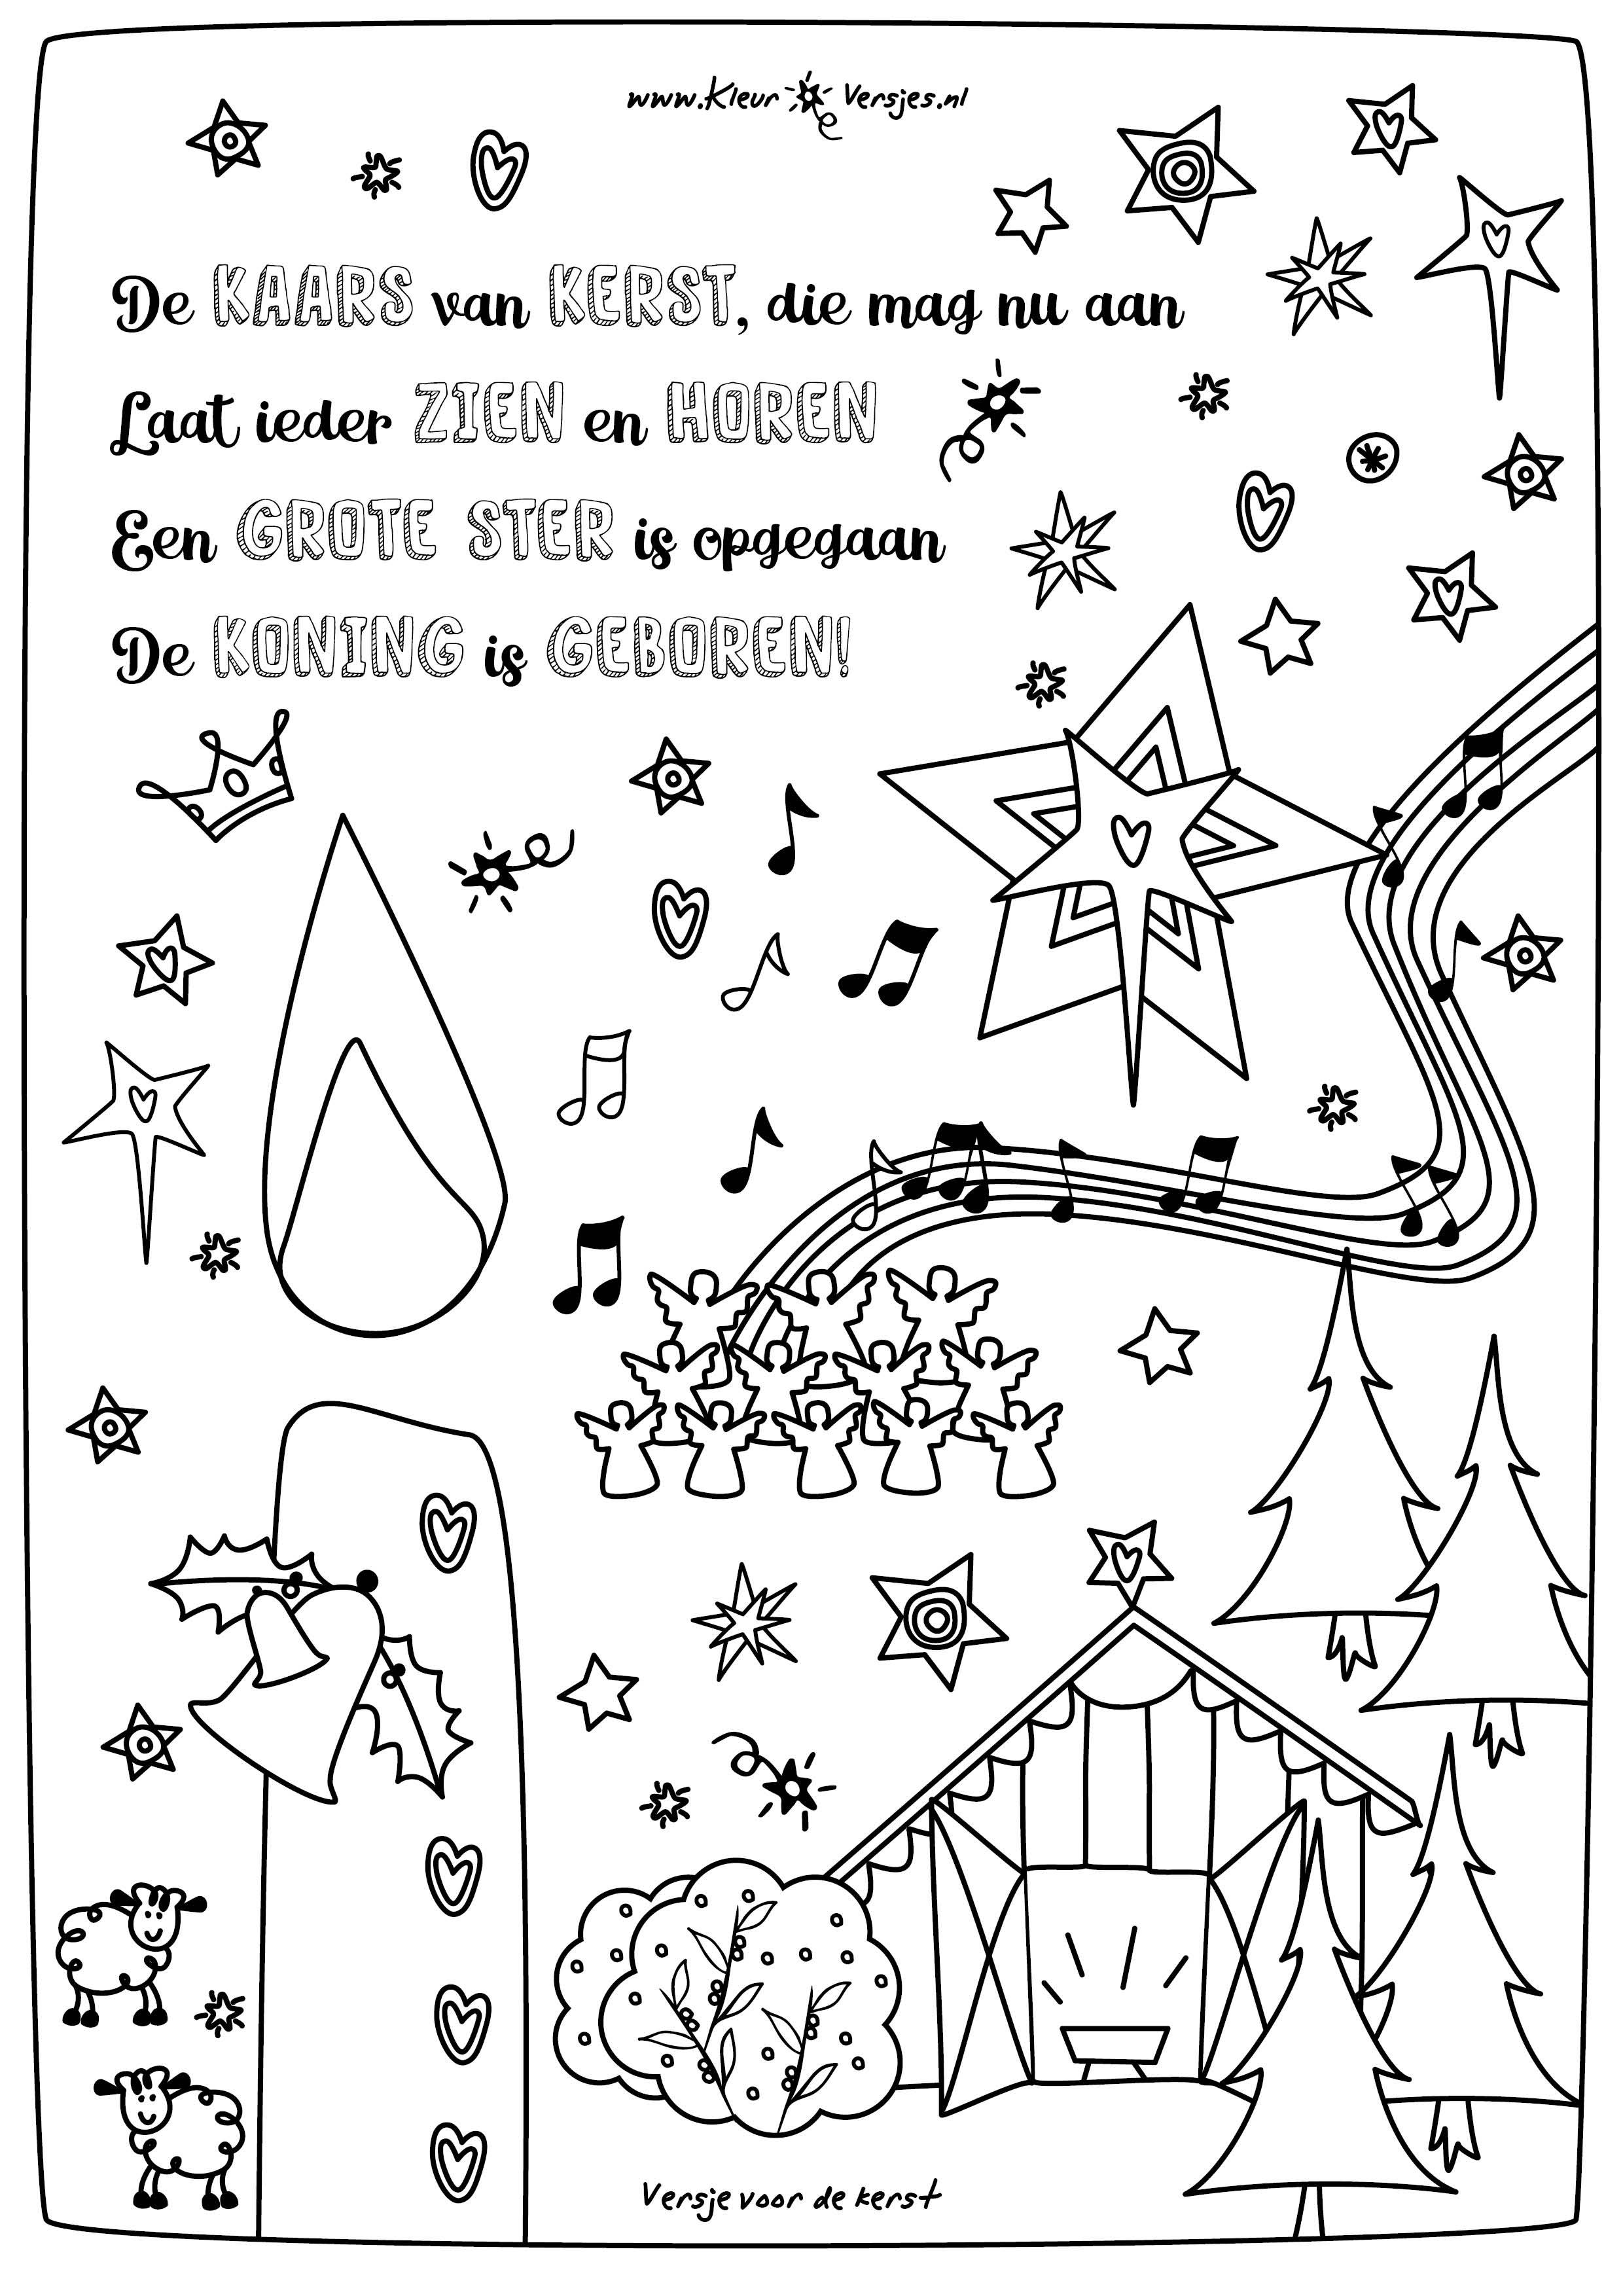 063 de kaars kerst kleurversjes nl